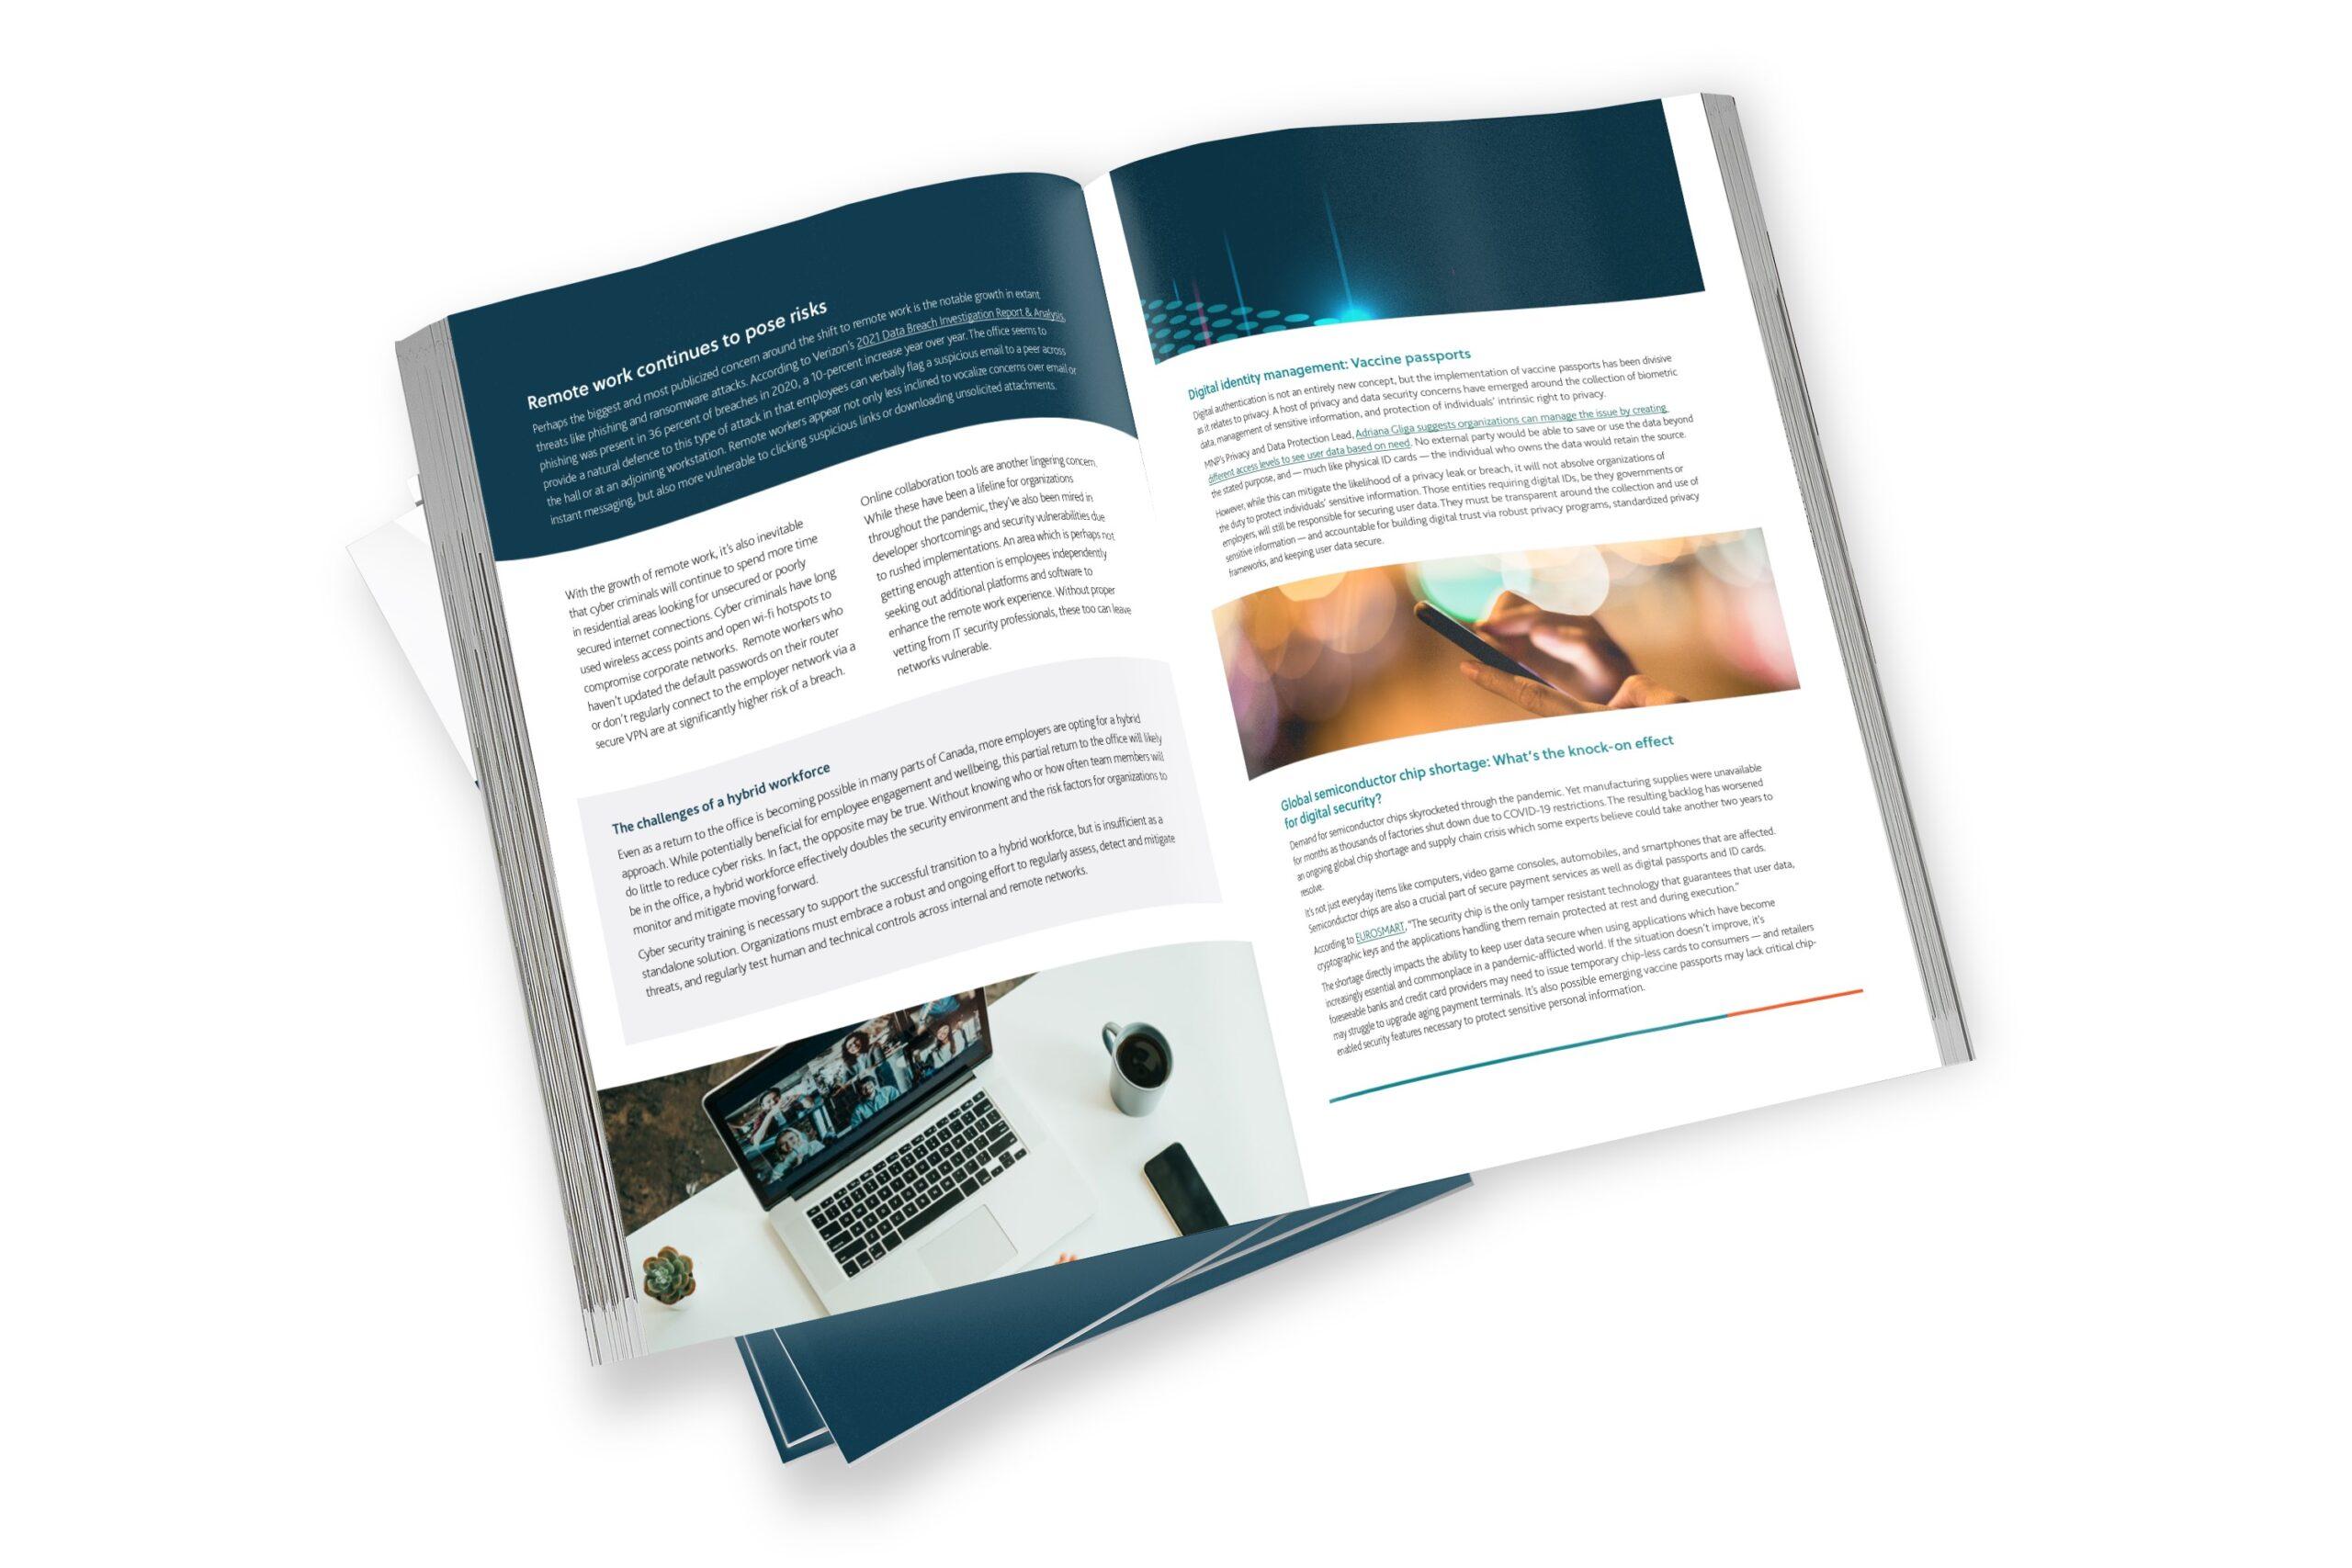 11MNP Digital Cyber Awareness whitepaper